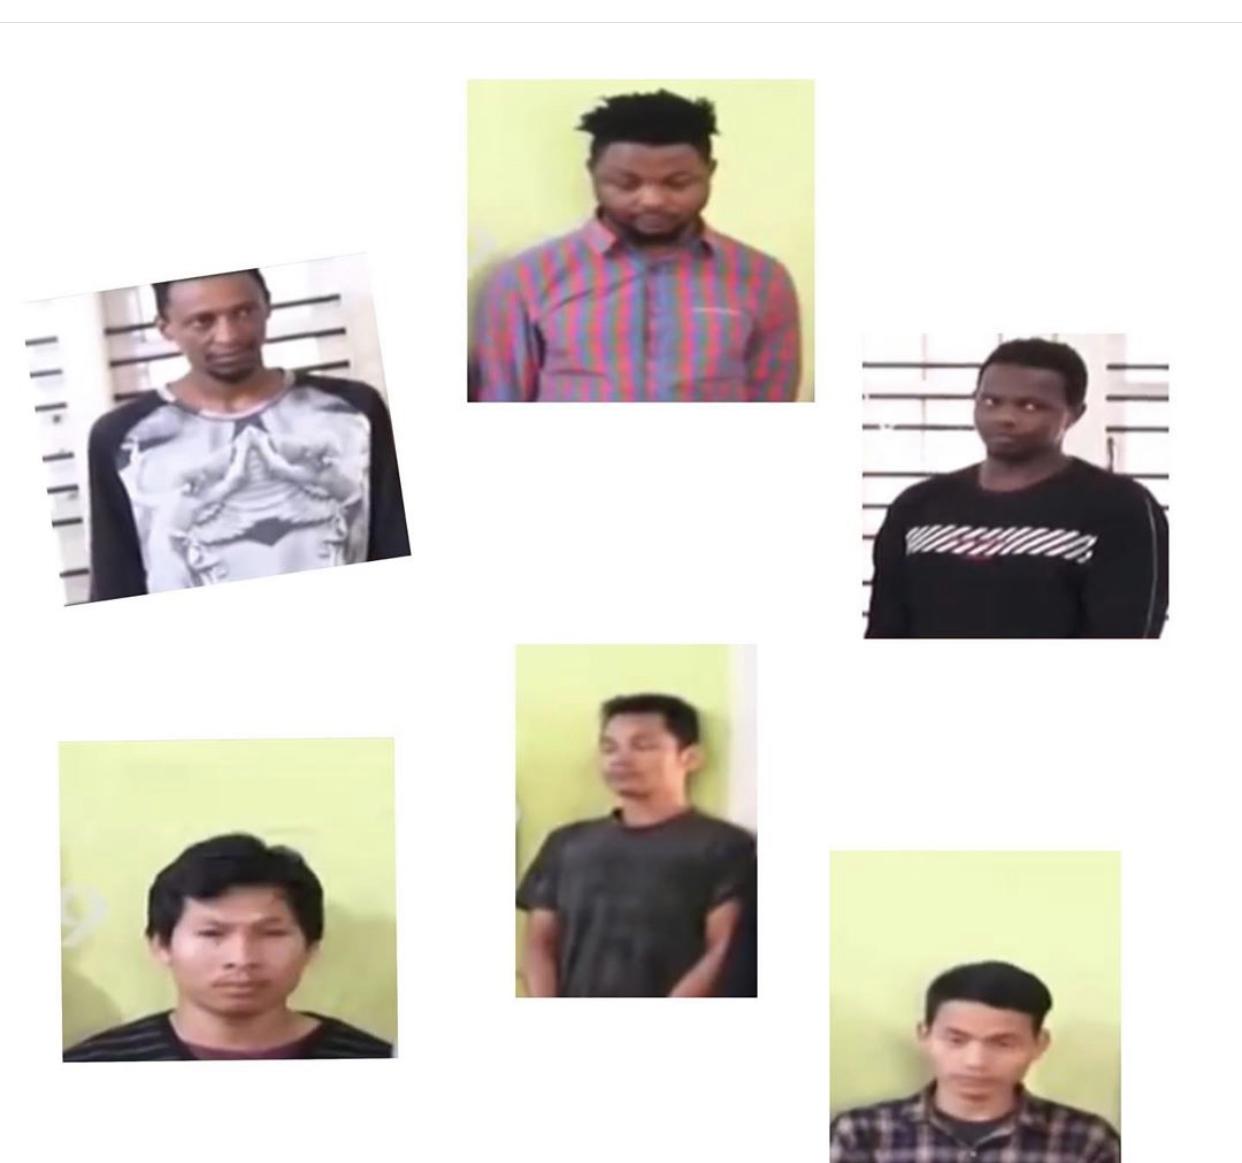 The six men